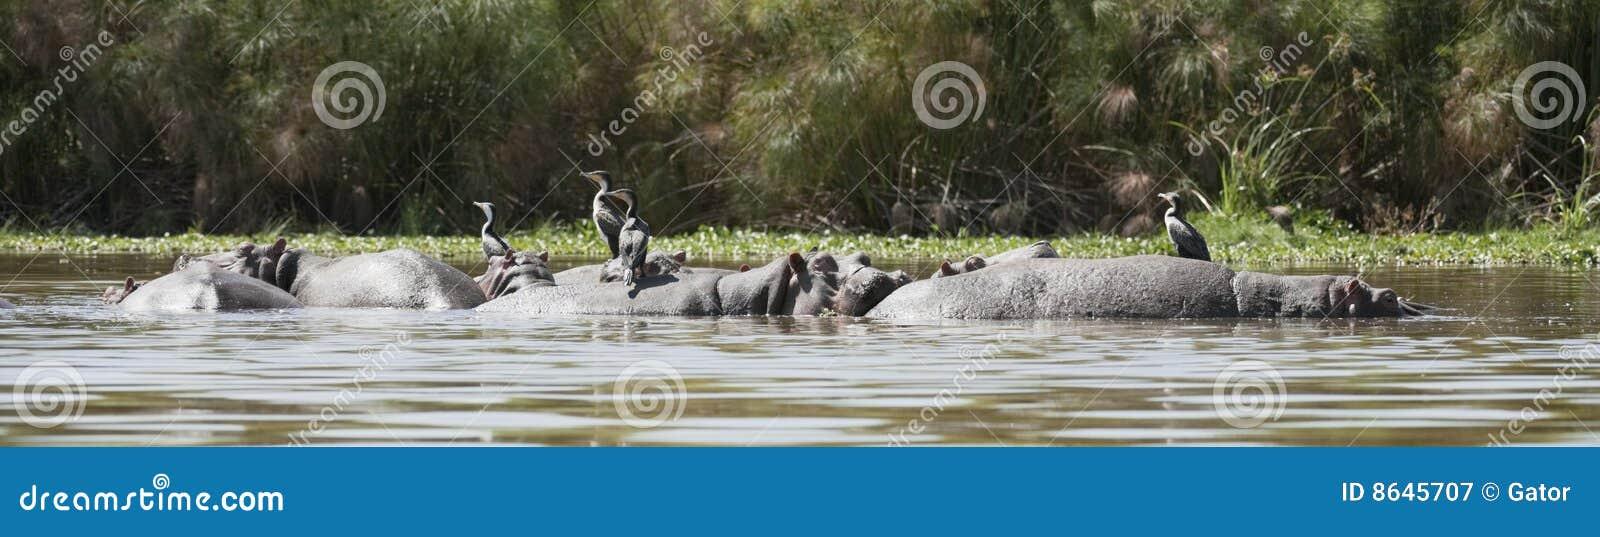 Great Cormorants resting on hippo backs